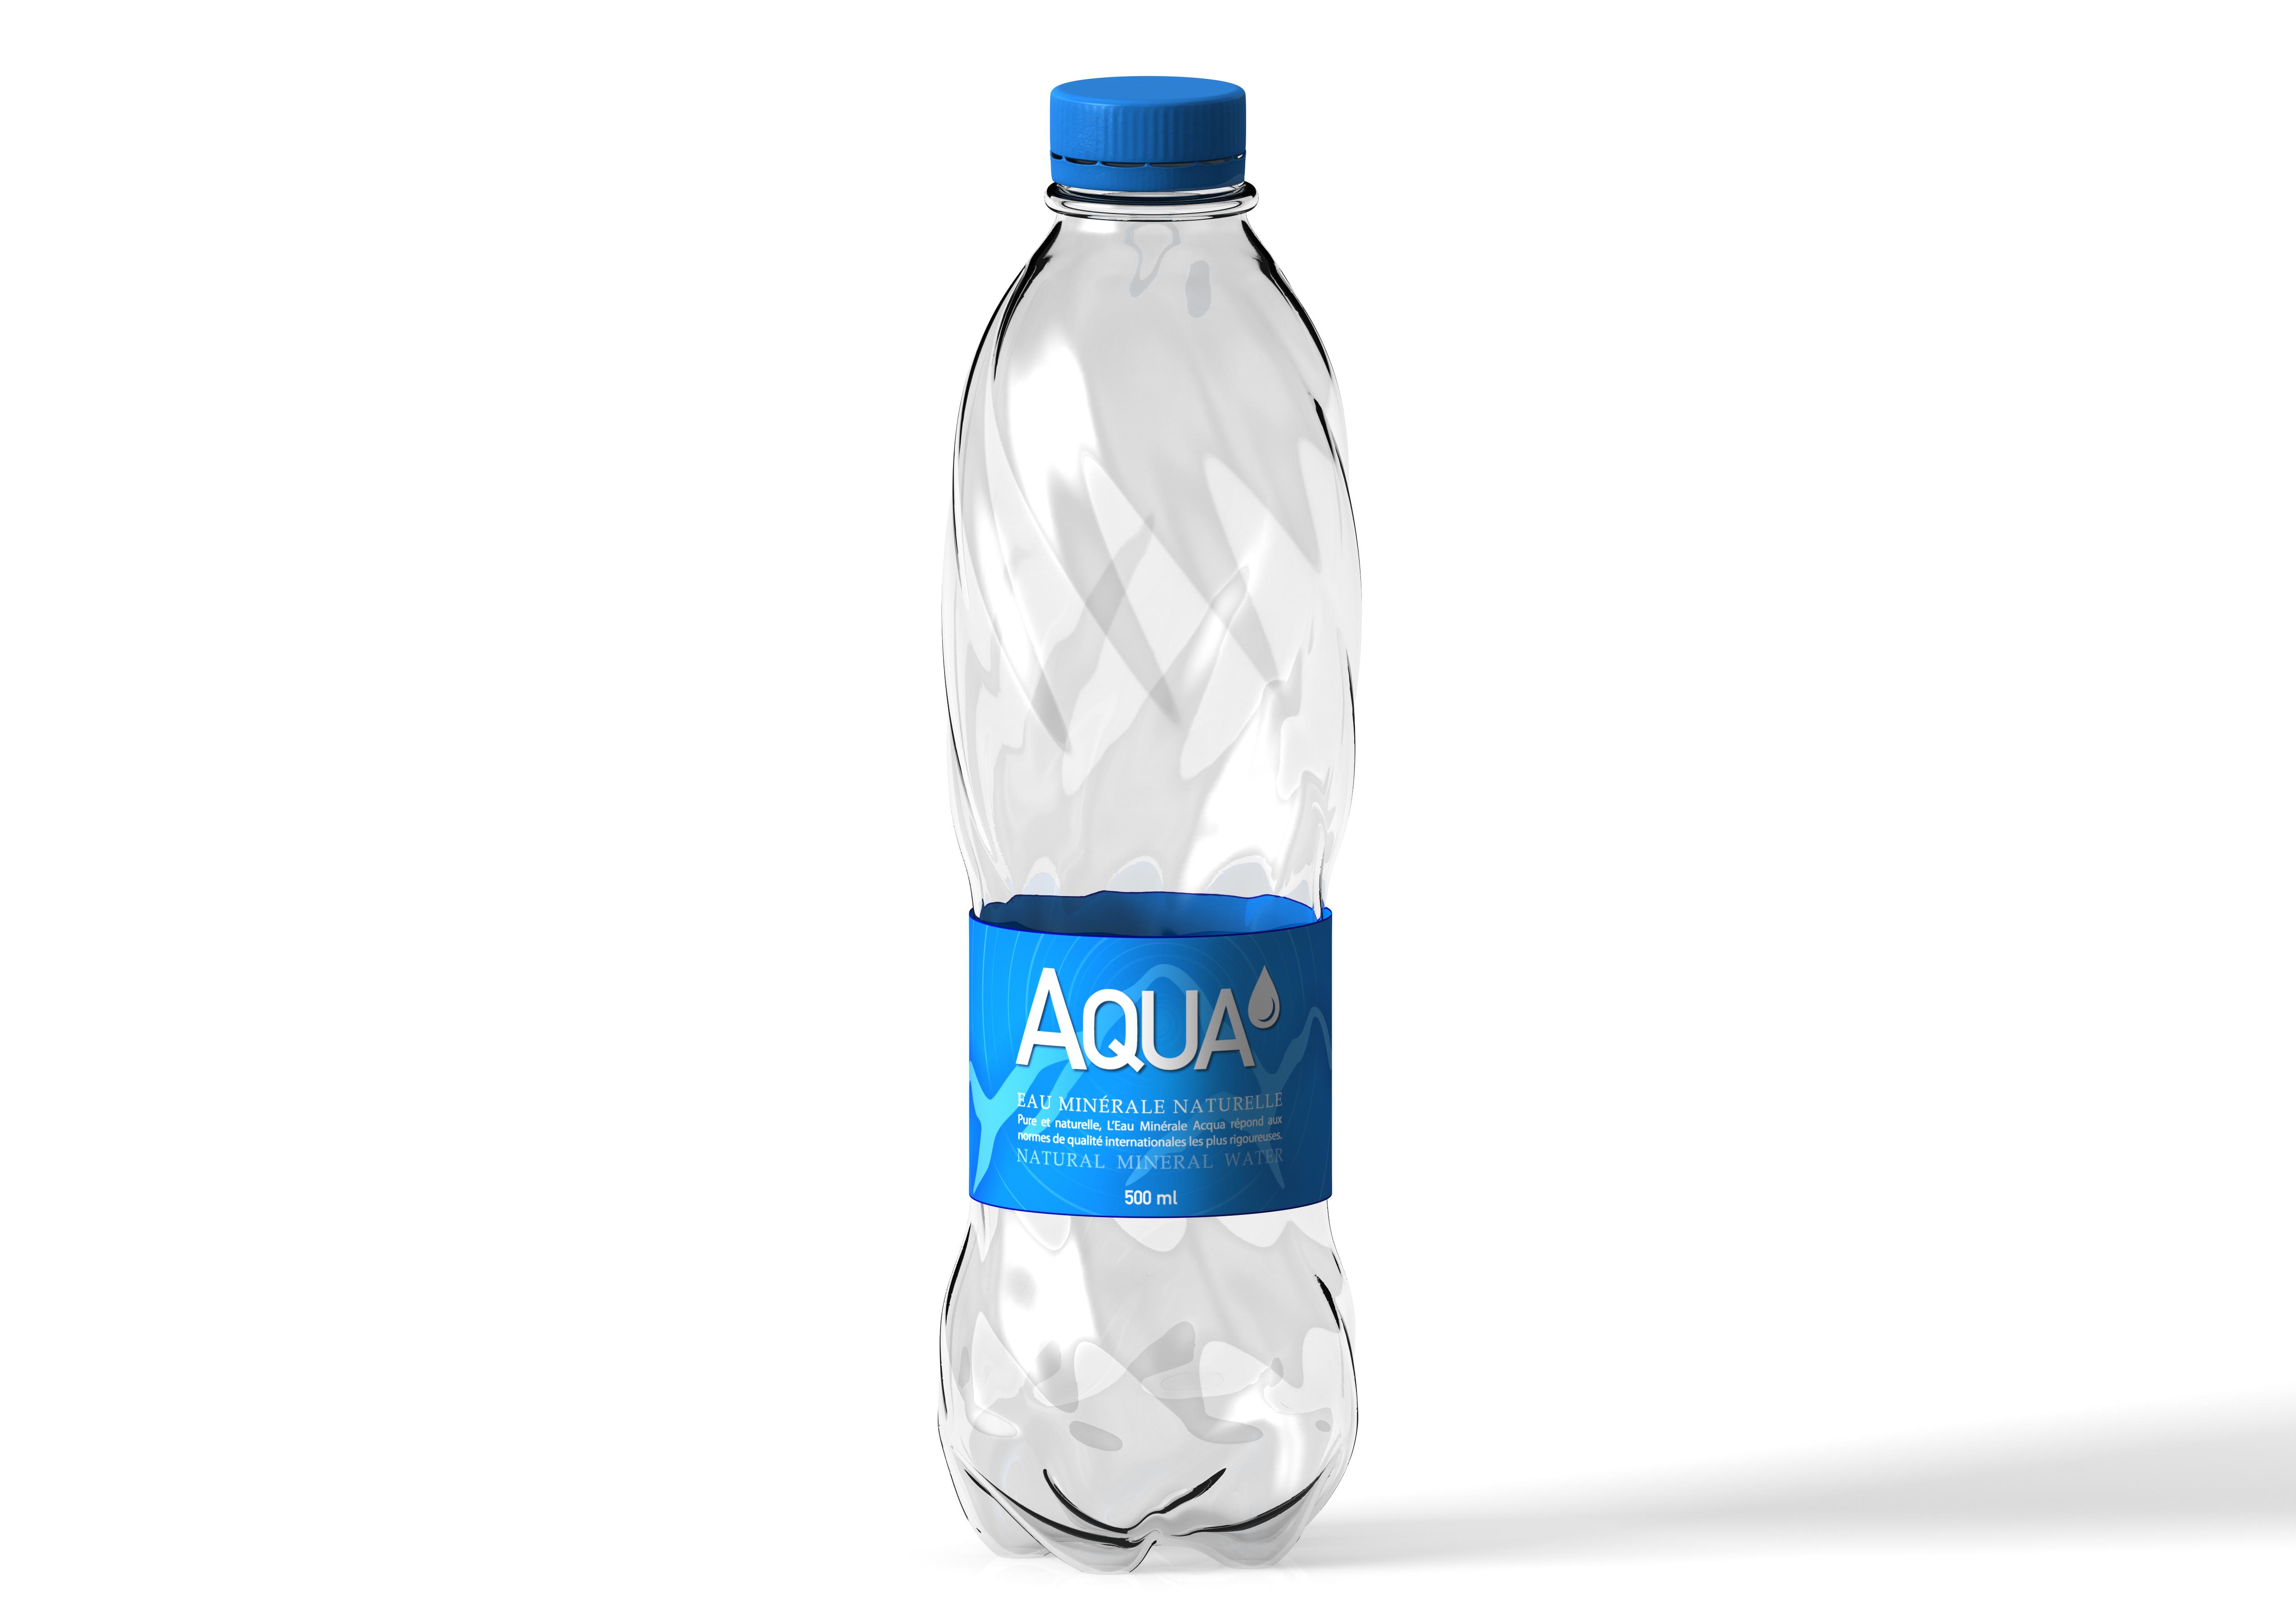 Www Omcdesign Com Hires Hires1860 Png Bottle Design Water Bottle Design Water Packaging